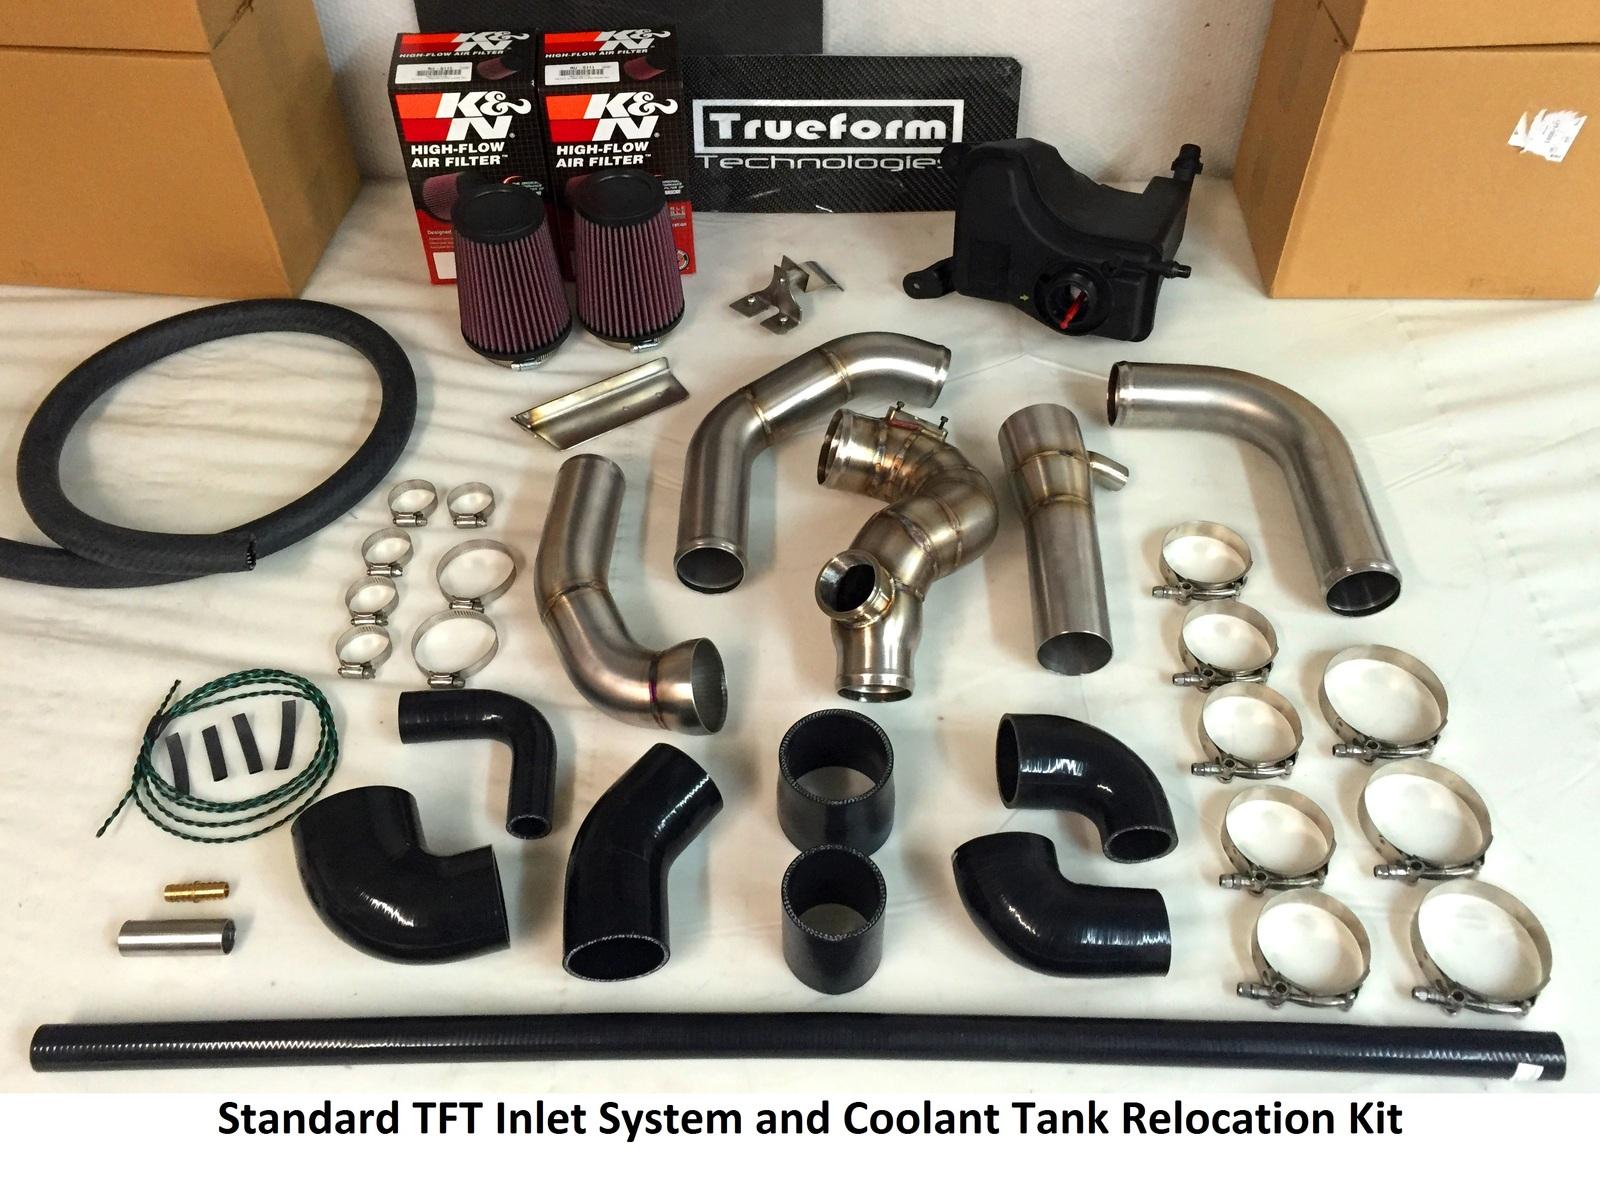 Standard-TFT-Inlet-System.jpg